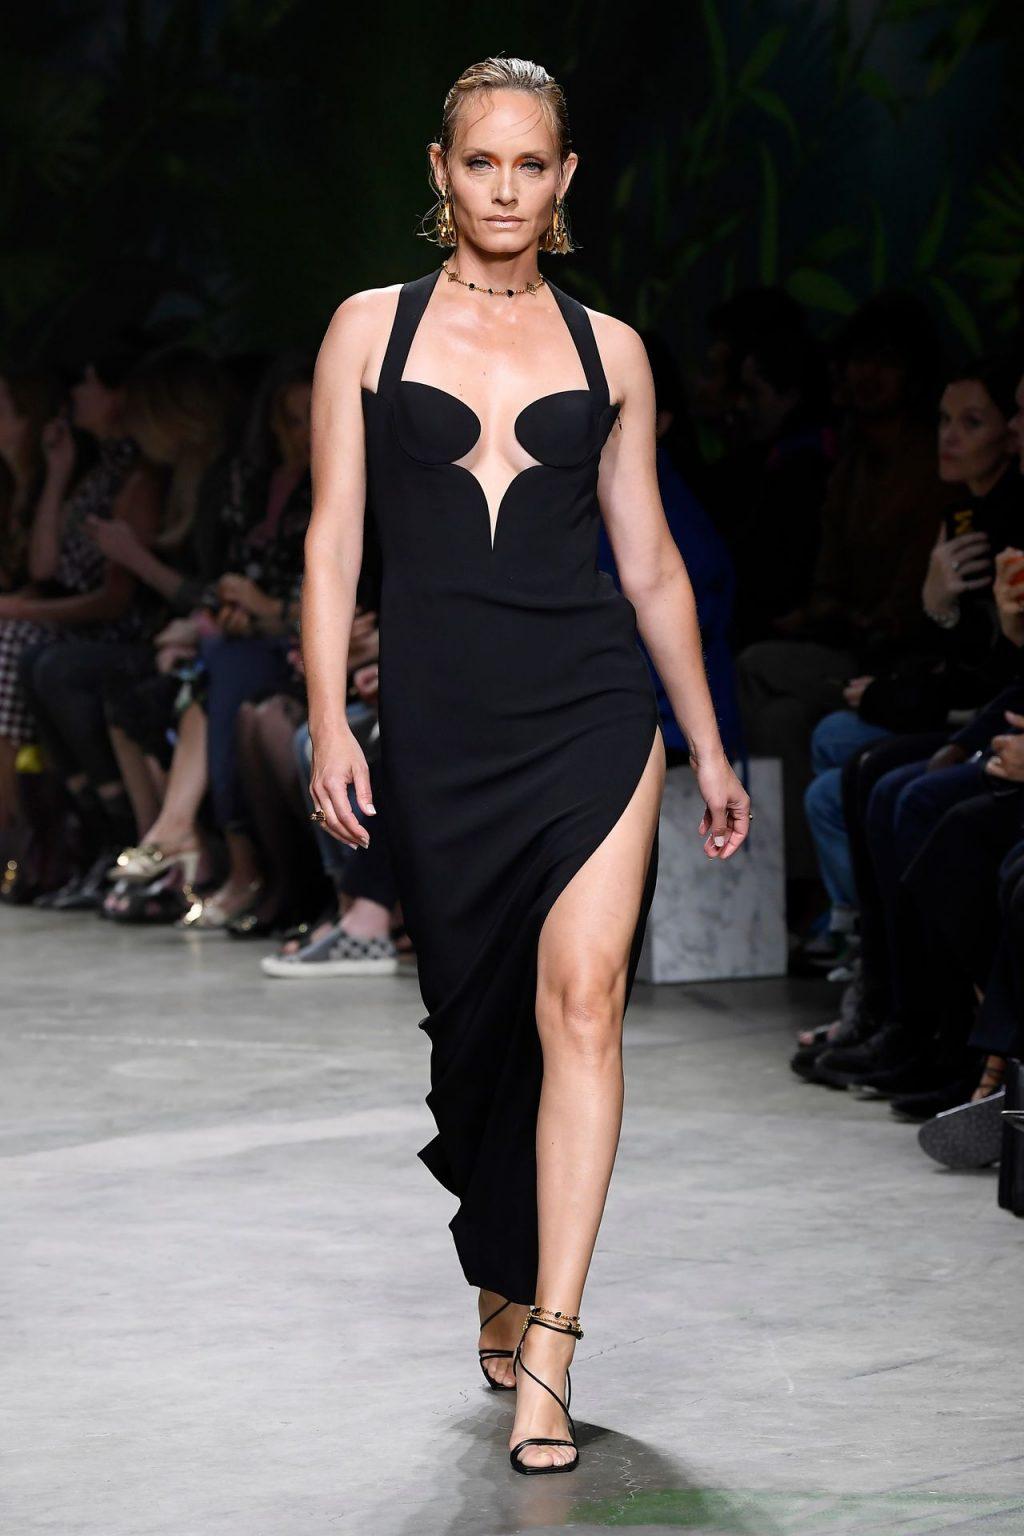 Amber Valletta Erotic